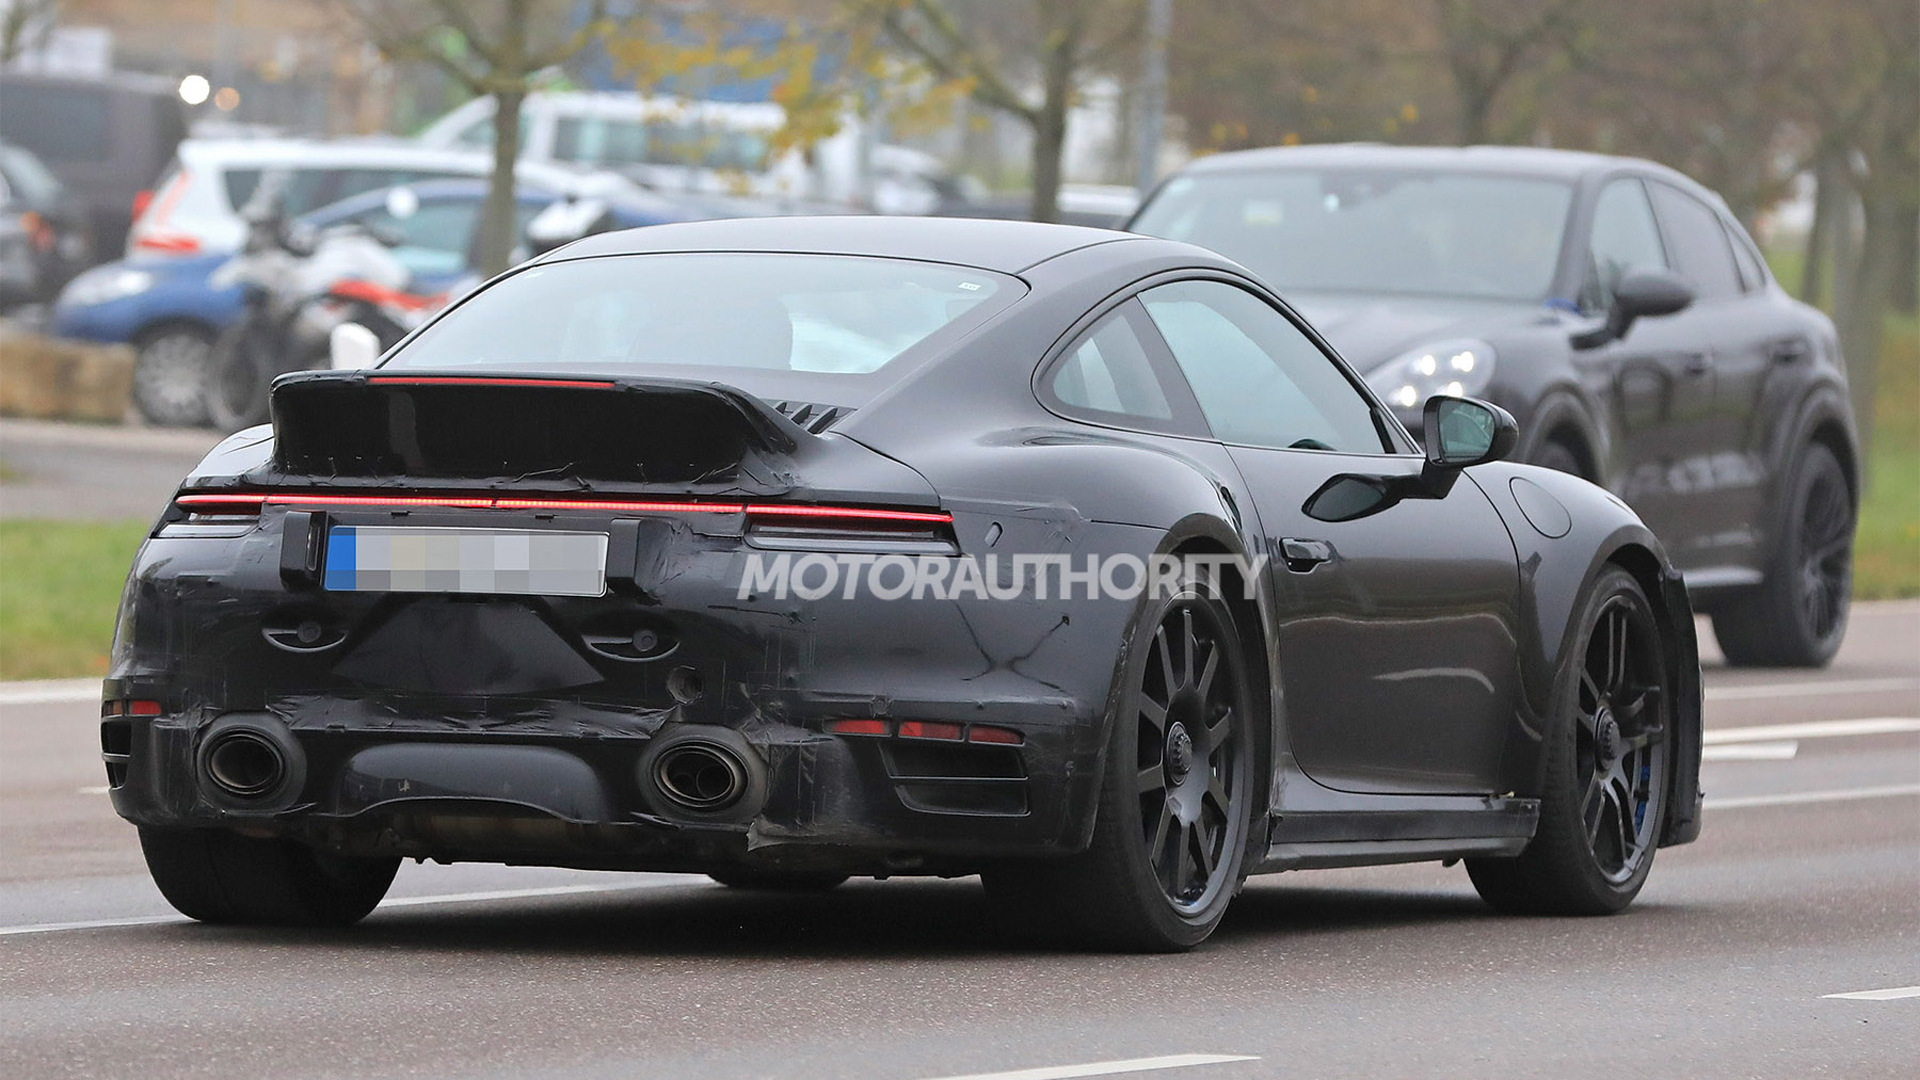 2020 Porsche 911 Turbo with ducktail spoiler spy shots - Photo credit: S. Baldauf/SB-Medien